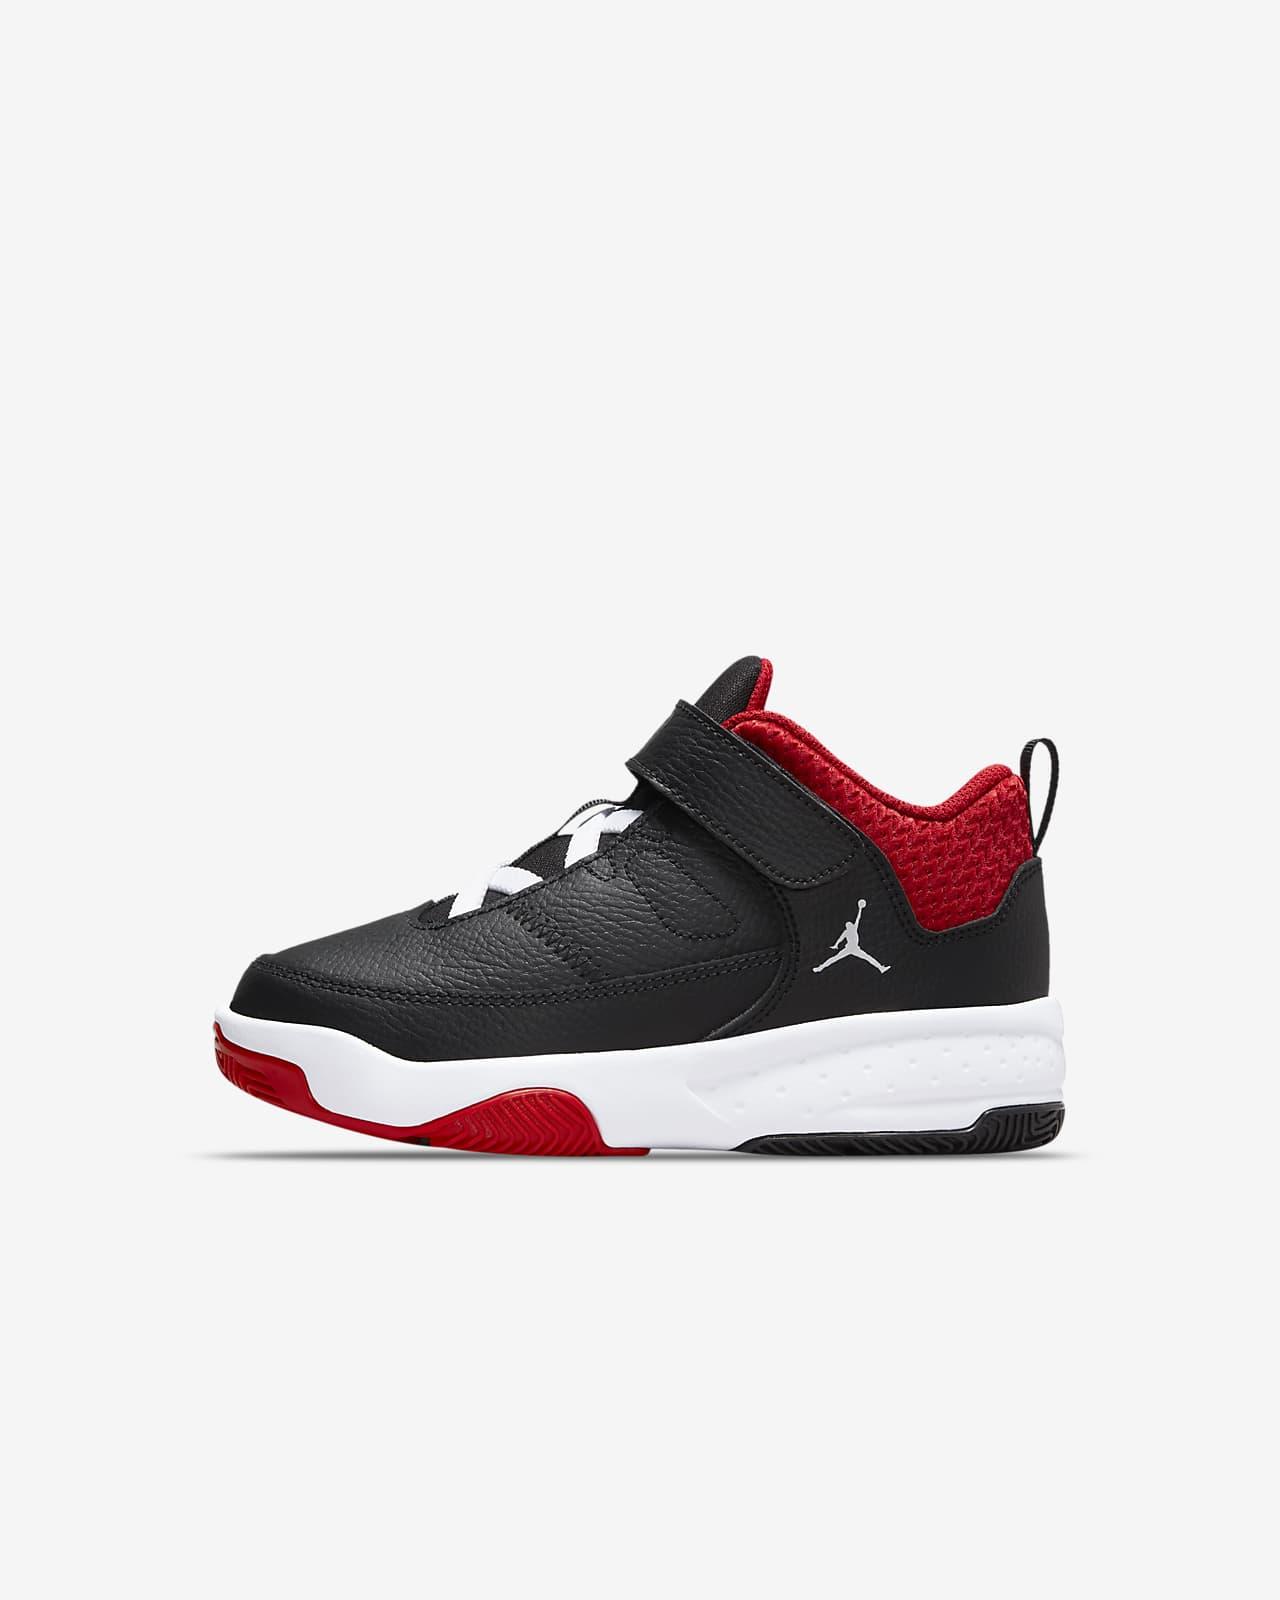 Jordan Max Aura 3 Little Kids' Shoe